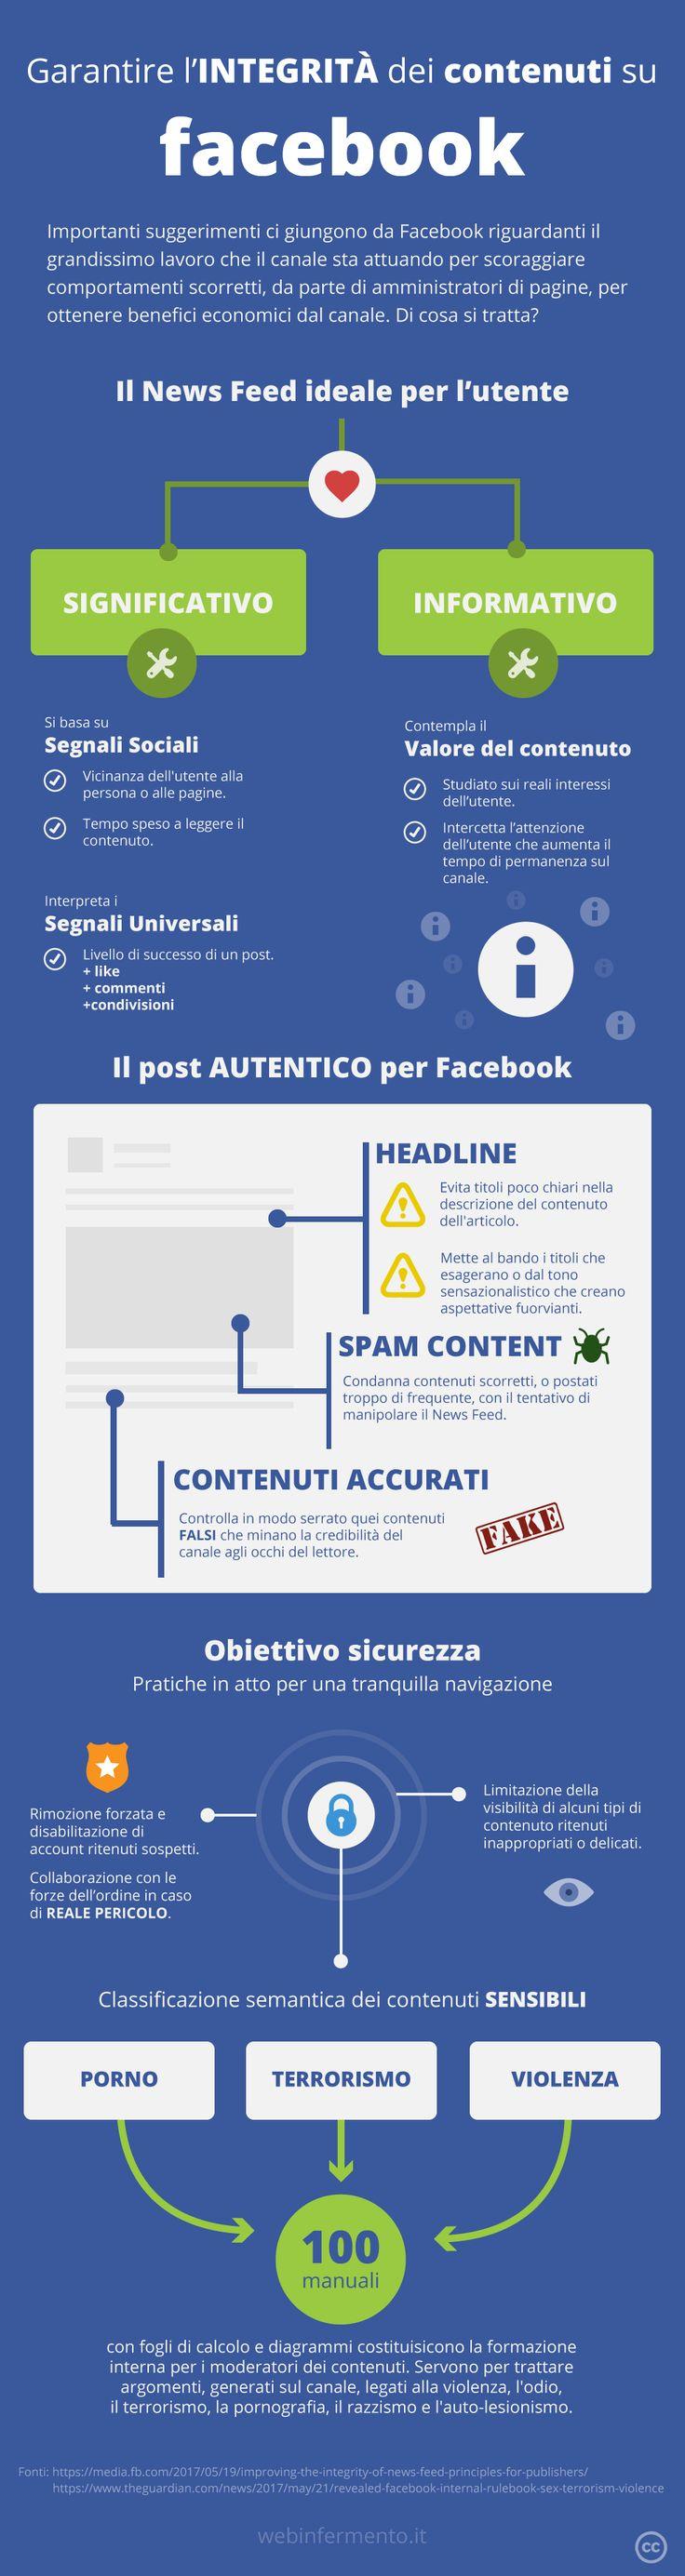 25 best Social Media Marketing Italia images on Pinterest